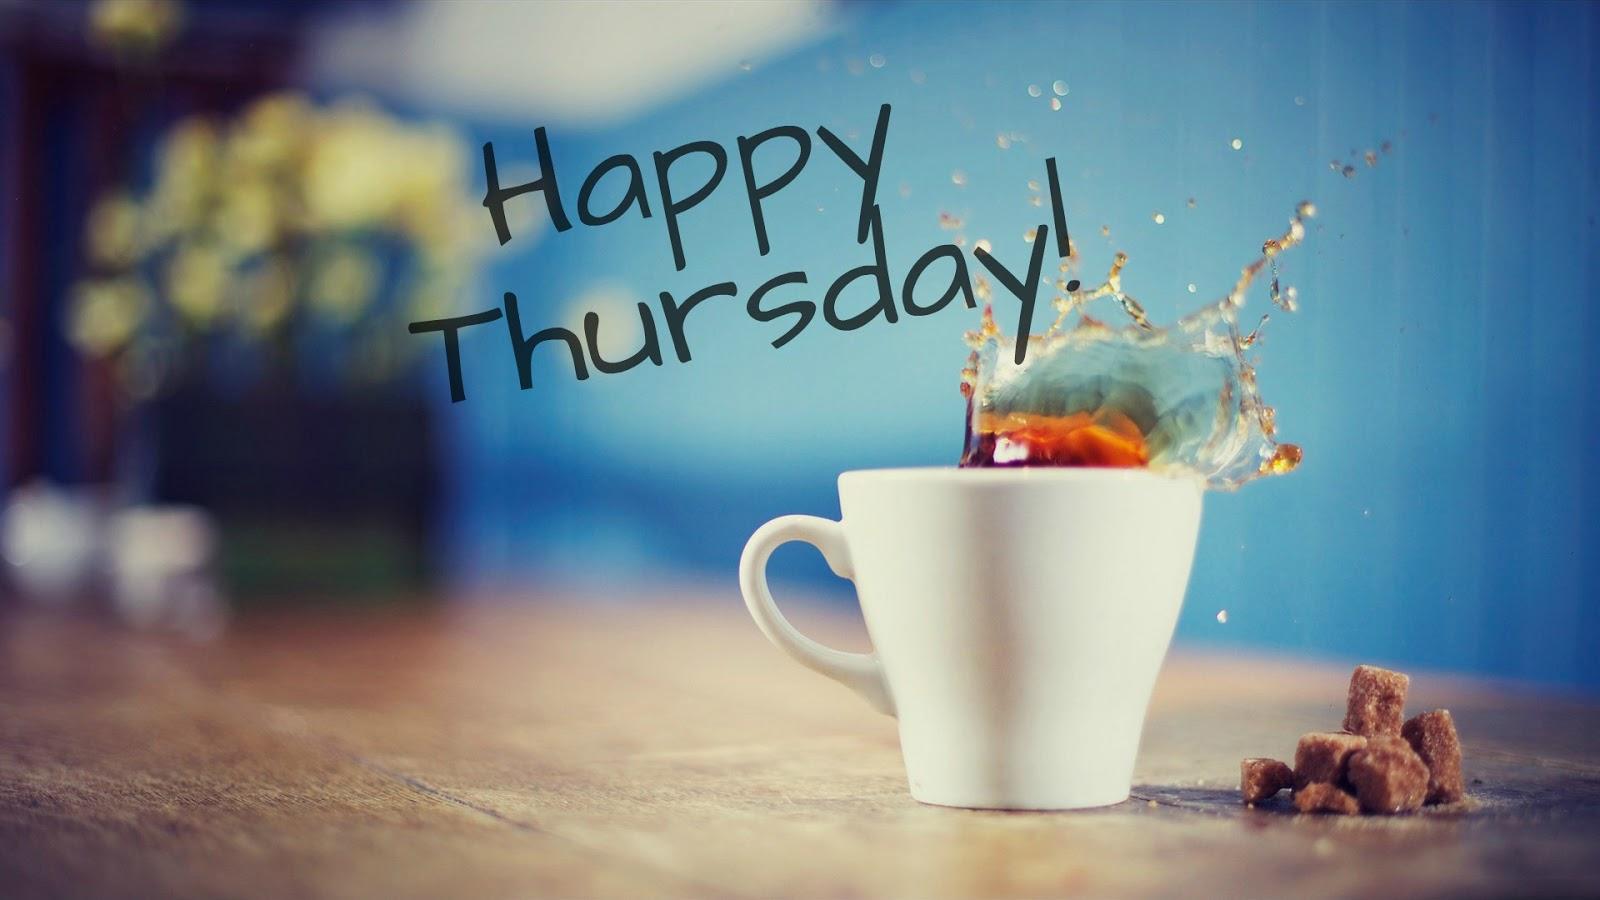 ImagesList.com: Happy Thursday 1